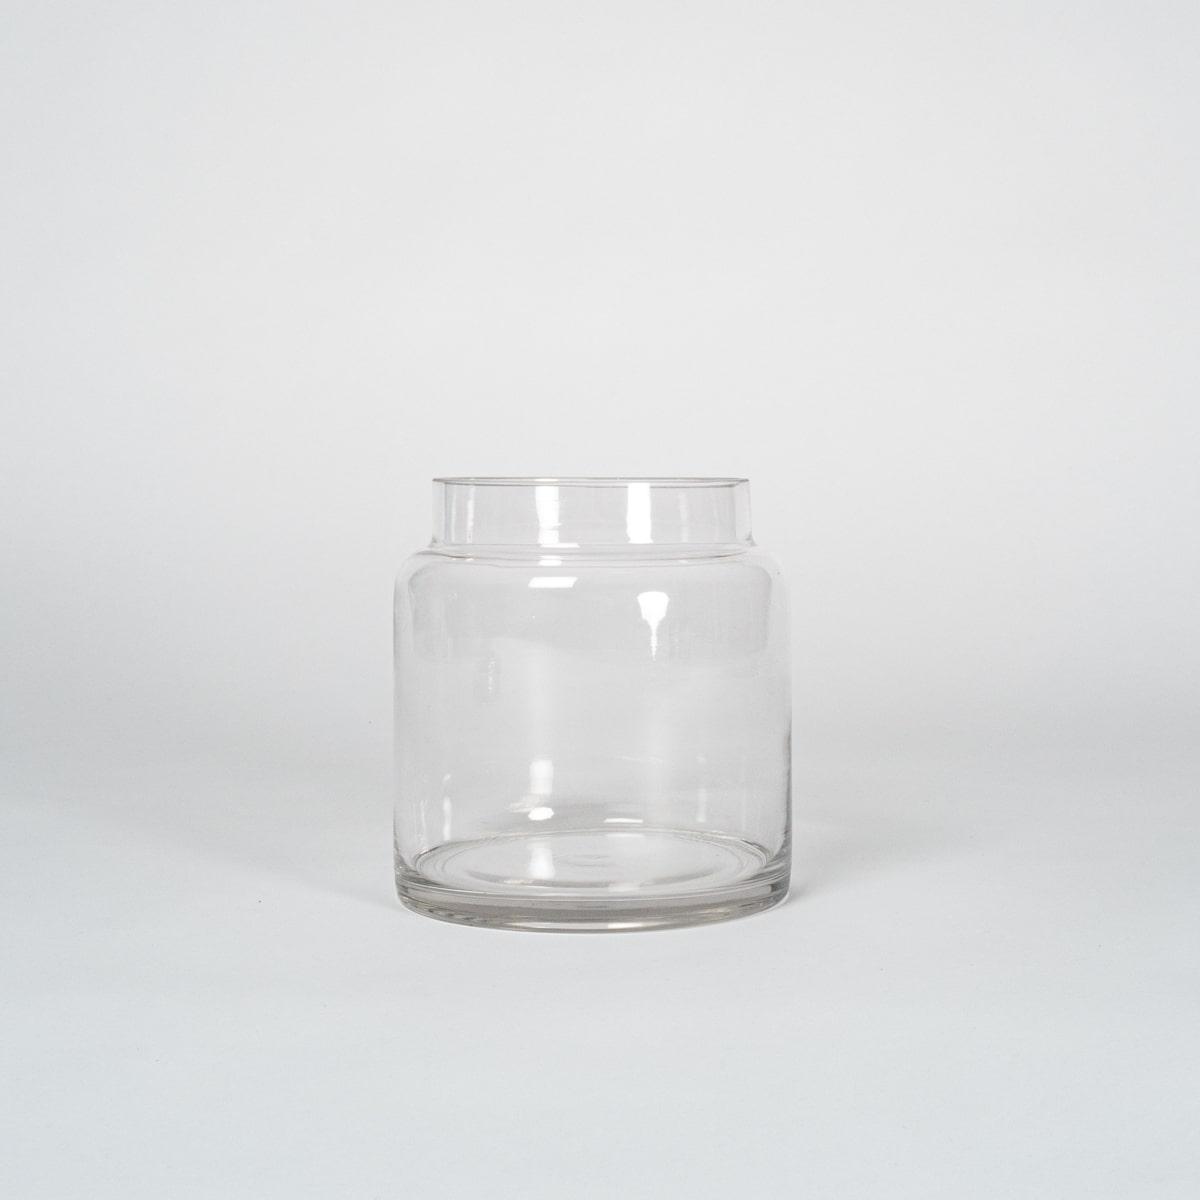 Bloom Flower Delivery | Clear Glass Chimney Vase